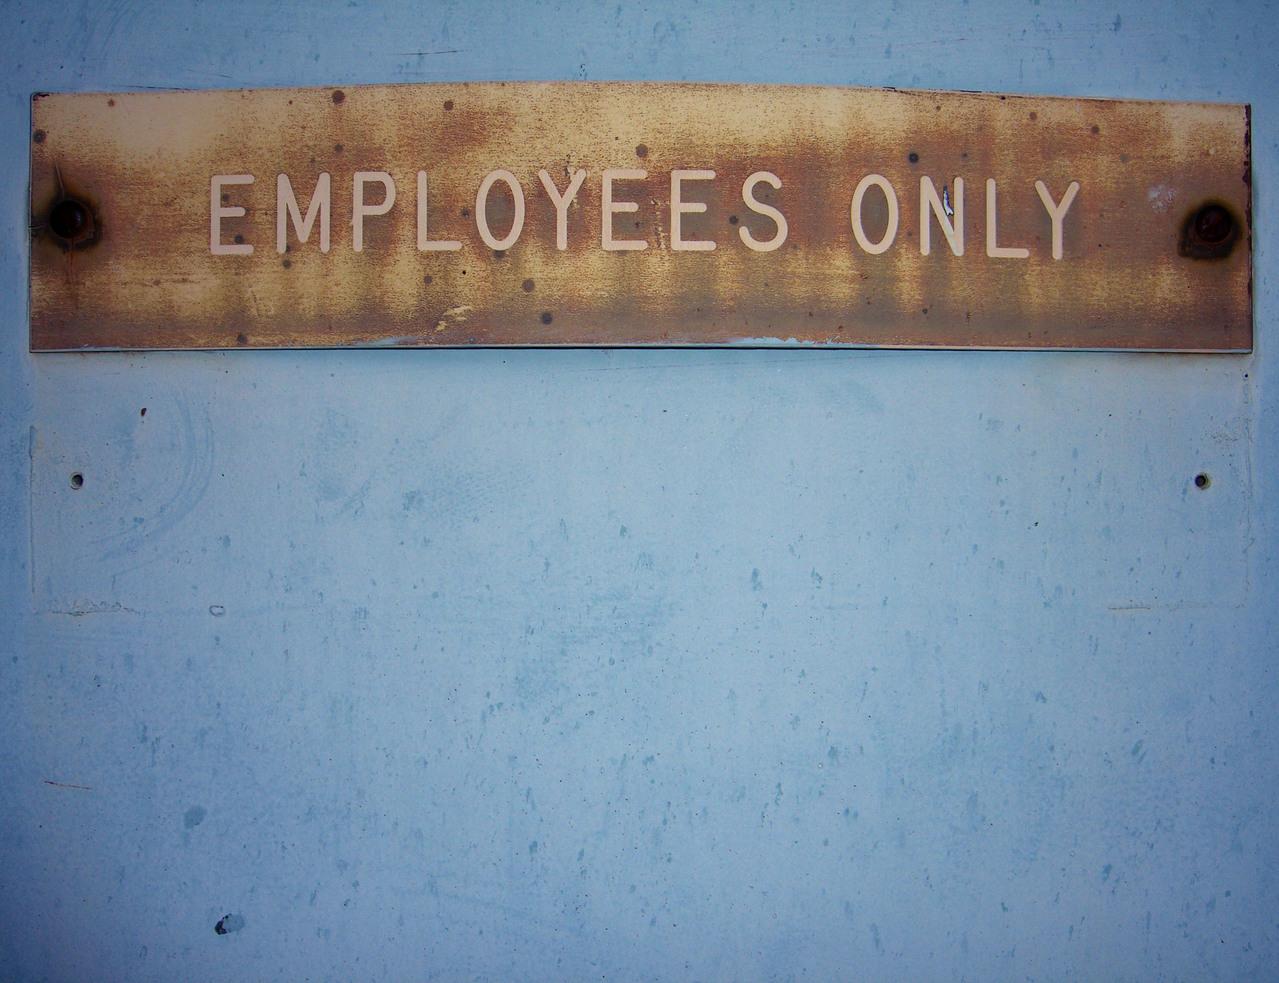 employee-entrance-1-1189151-1279x982.jpg